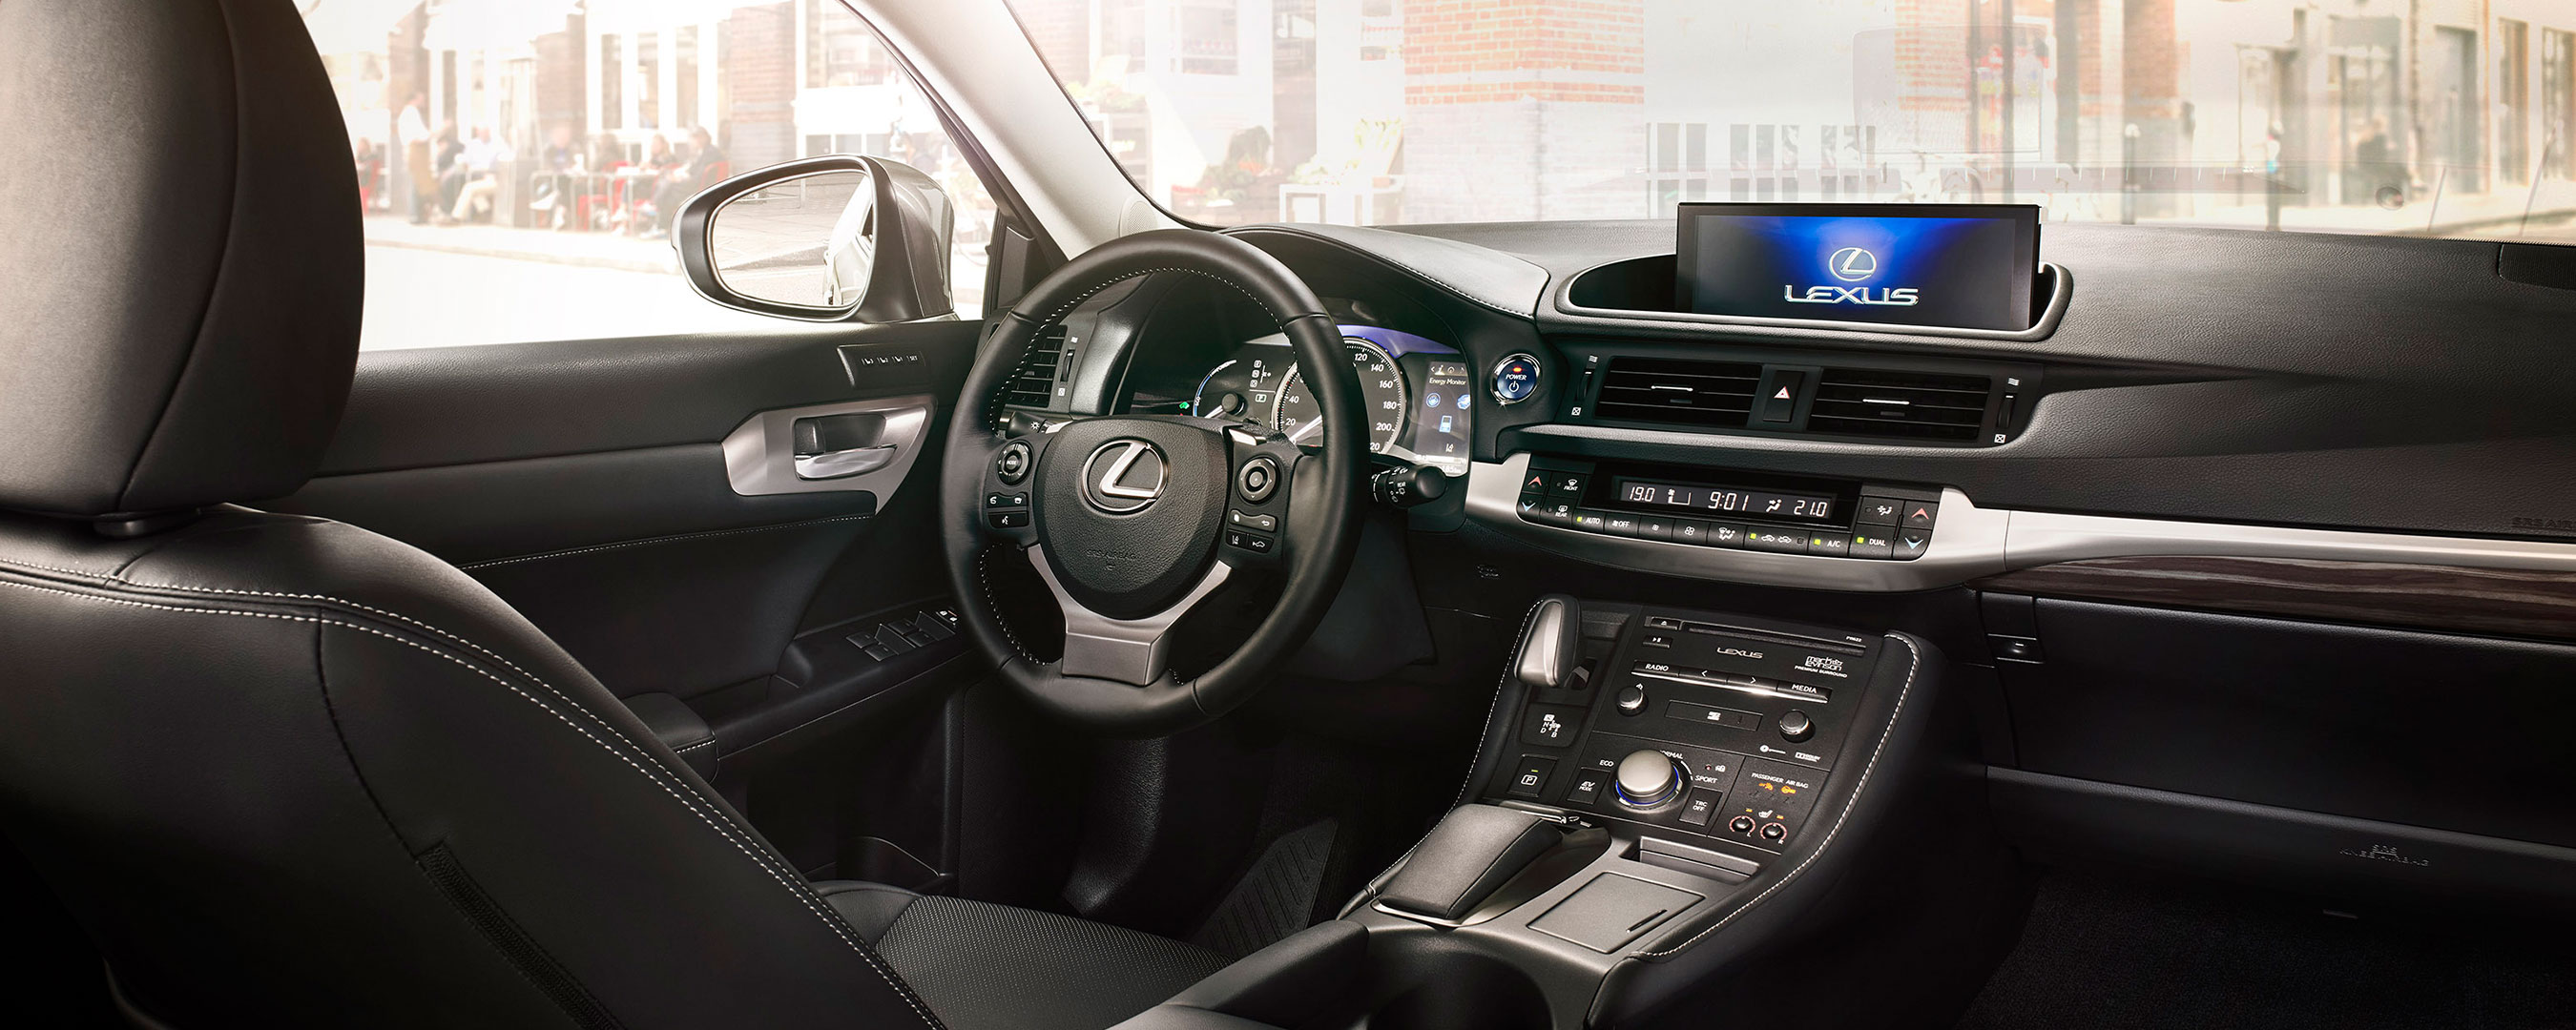 2018 lexus ct 200h my18 experience hero interior front